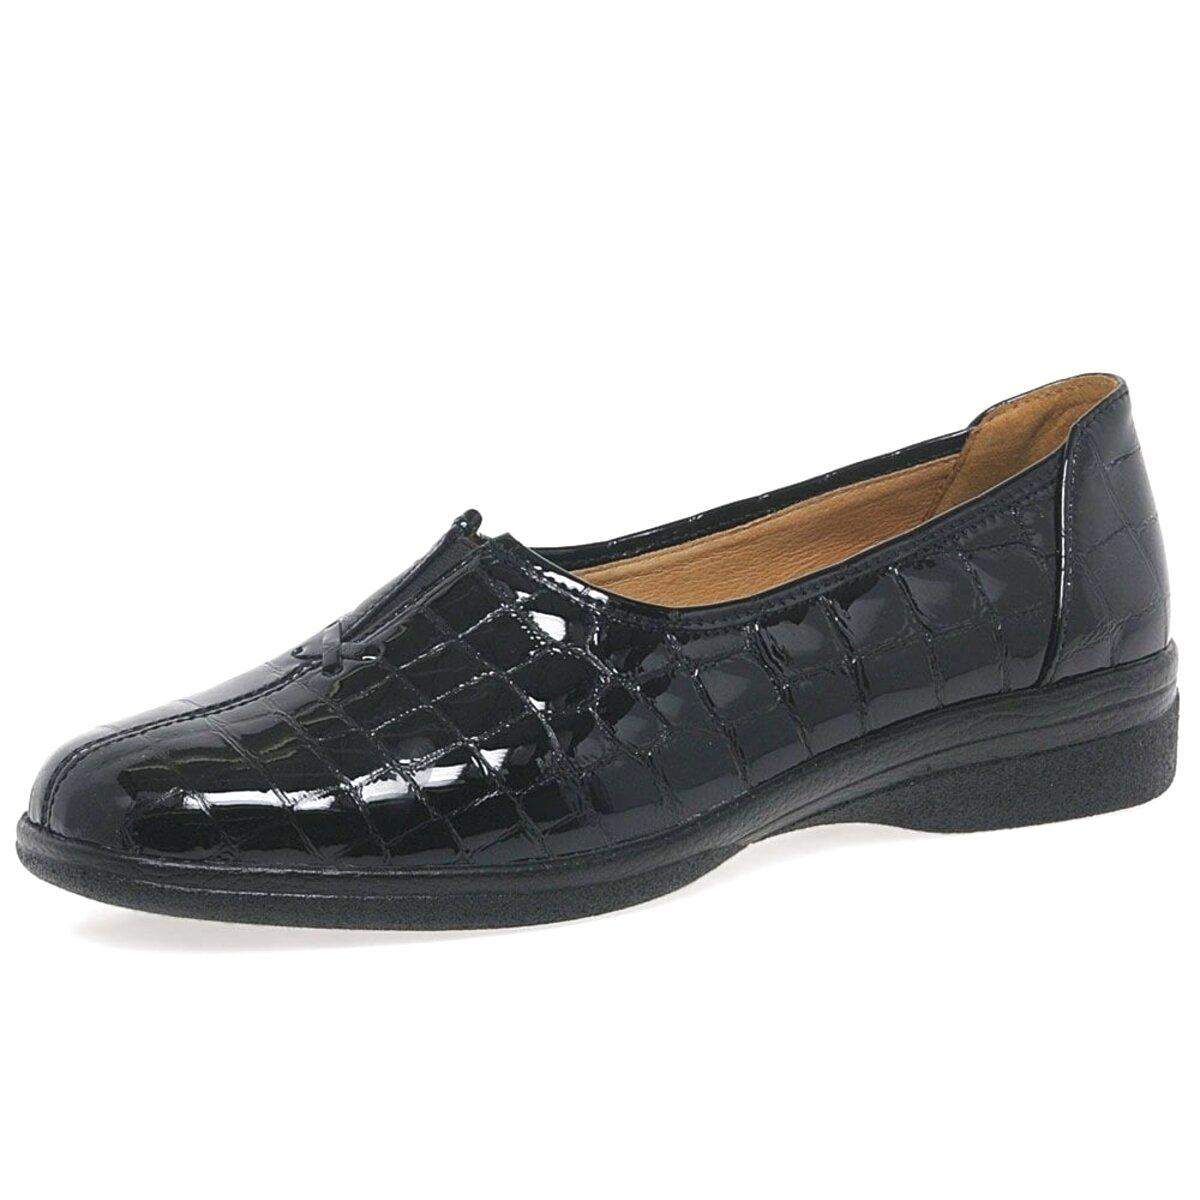 ladies gabor shoes for sale